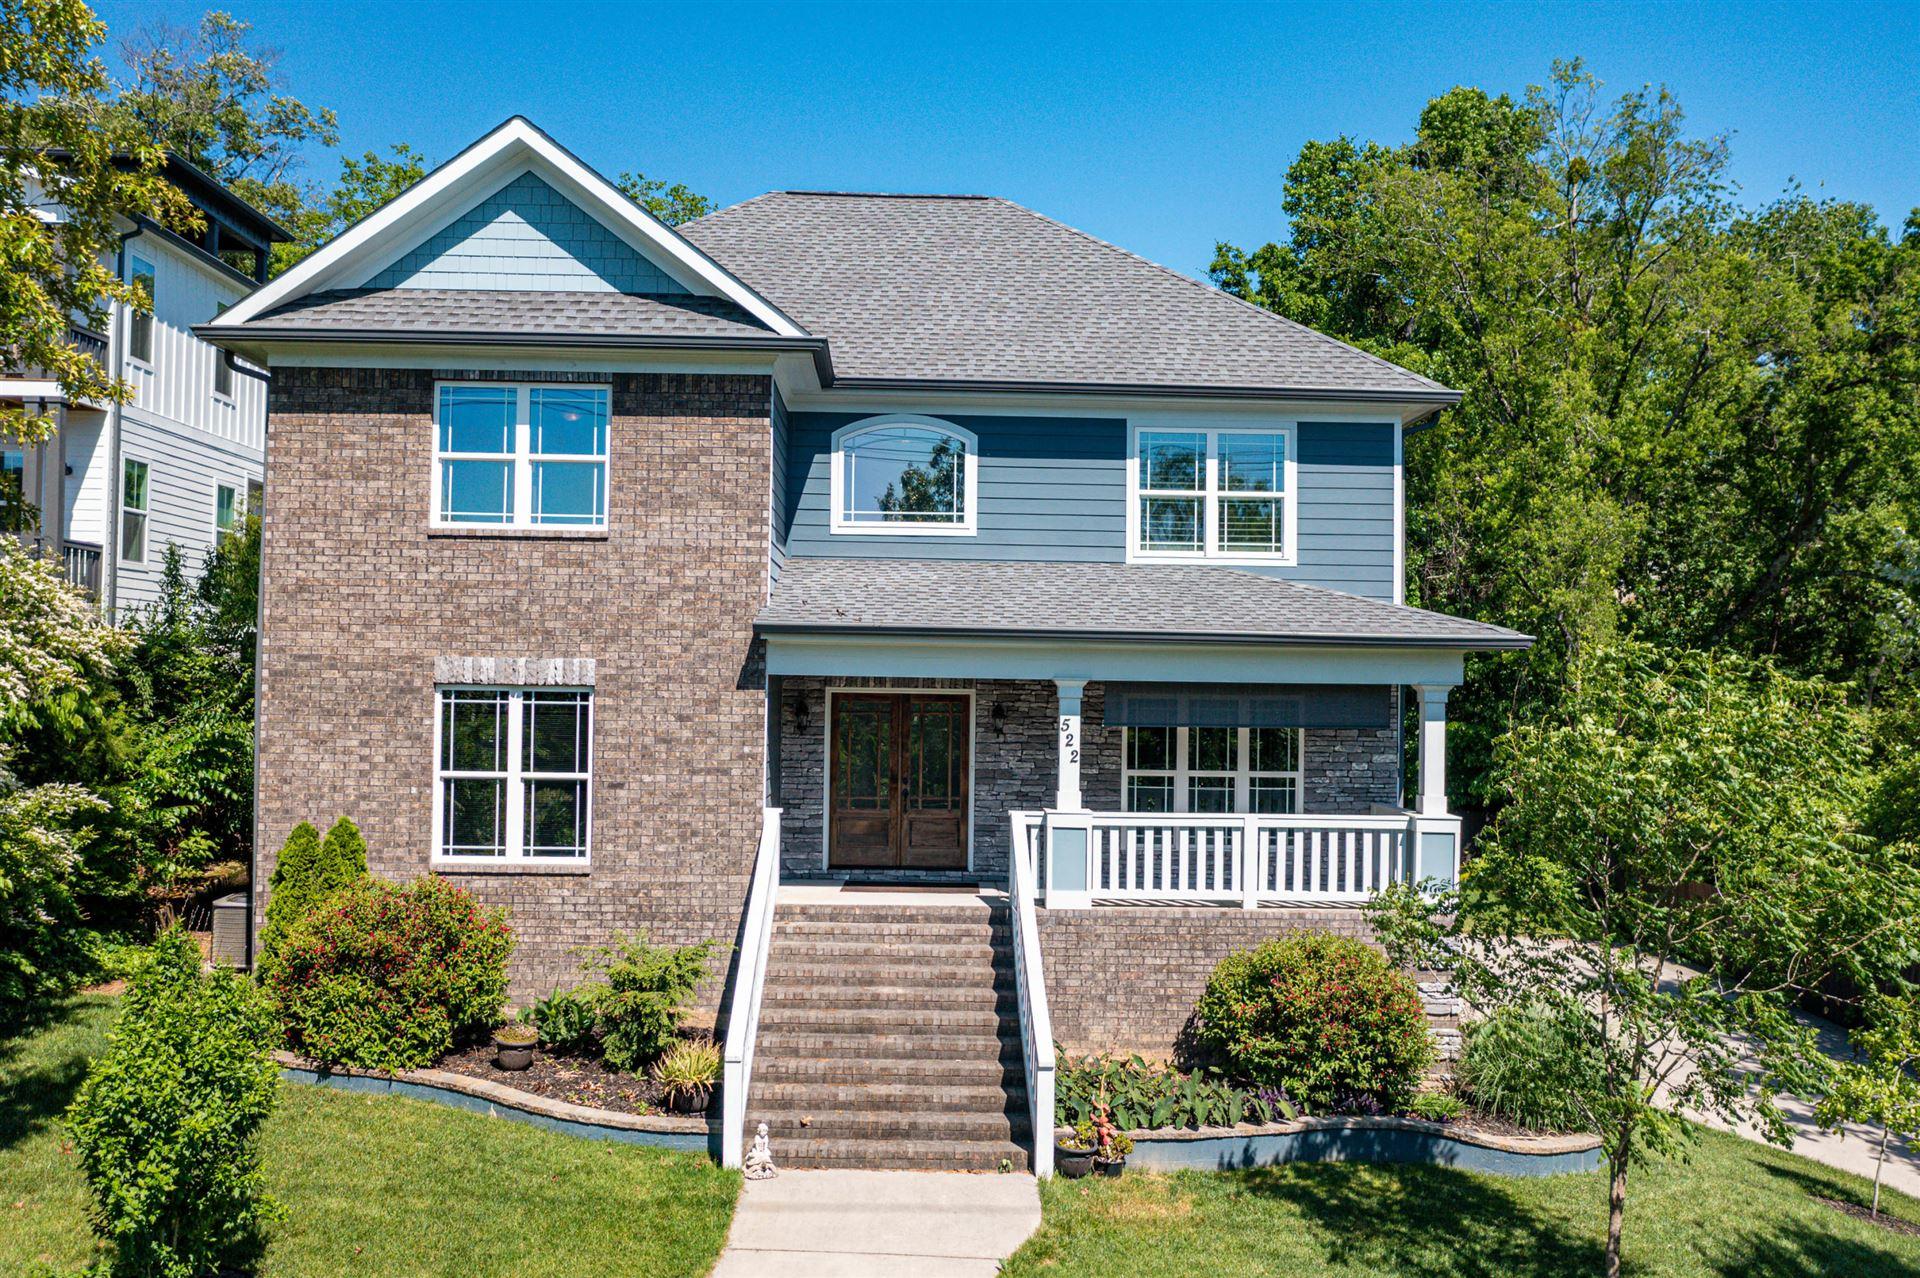 522 Hamilton Ave, Chattanooga, TN 37405 - MLS#: 1335625